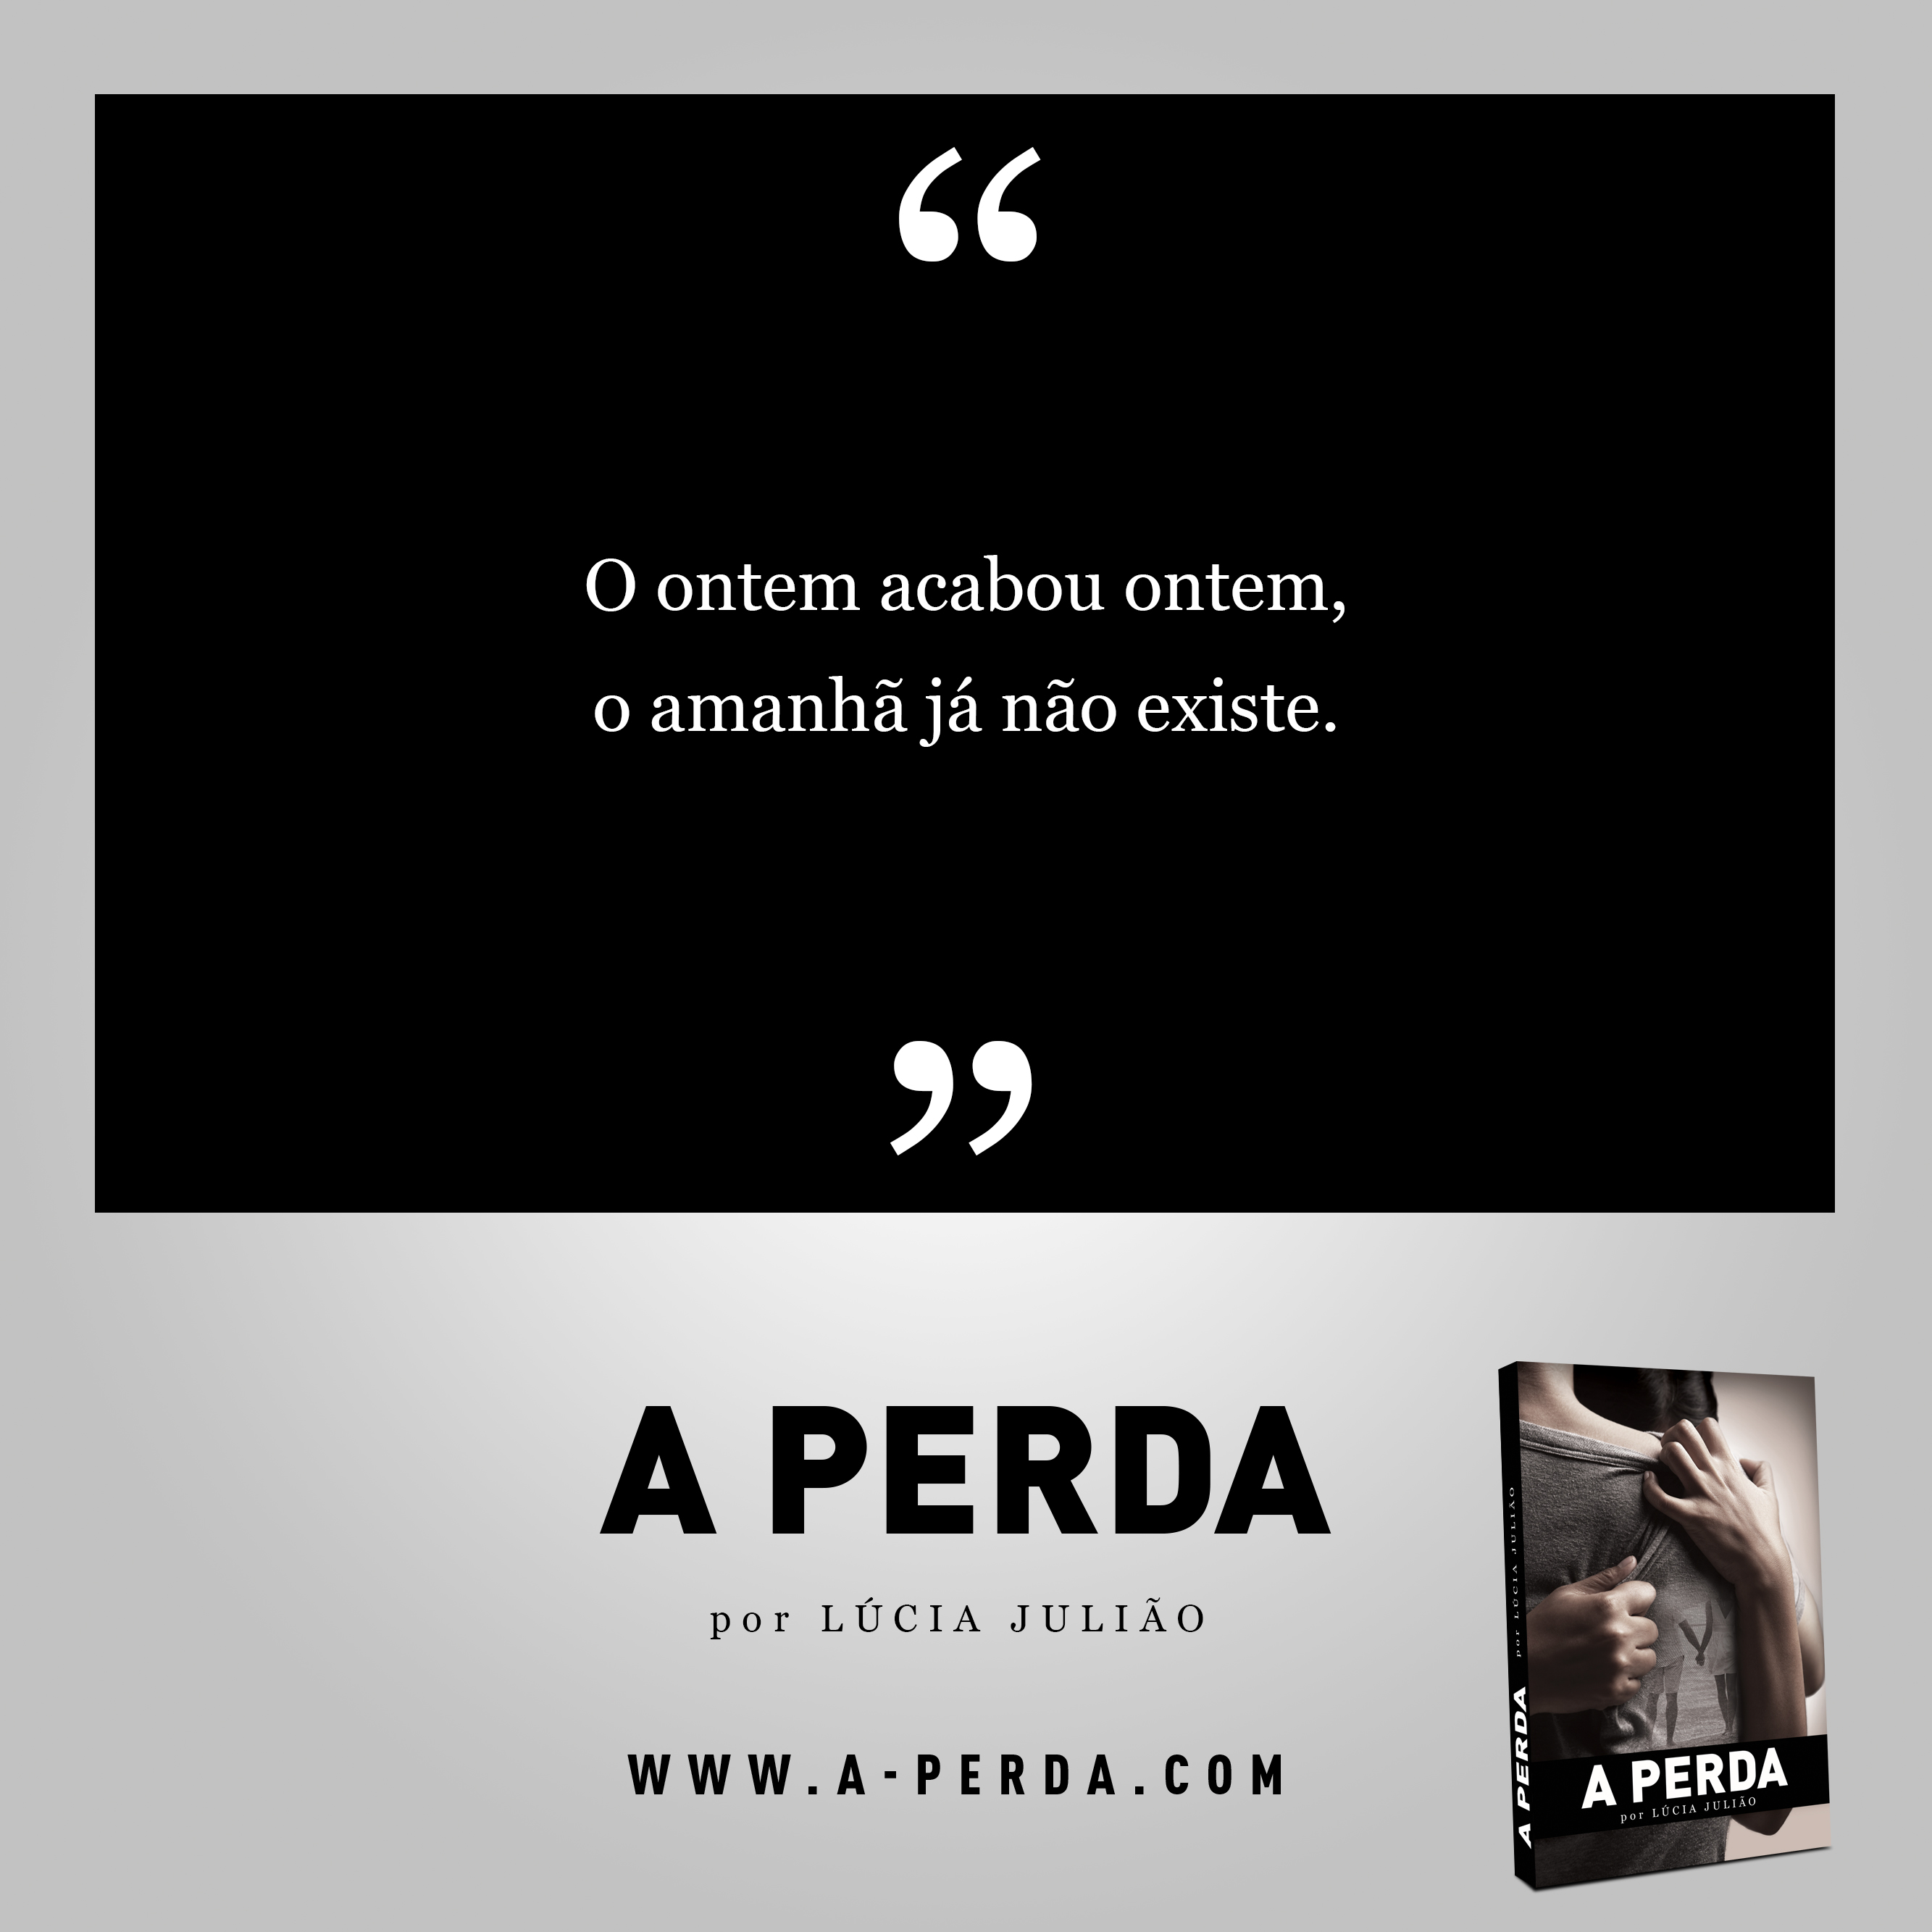 026-capitulo-1-livro-a-Perda-de-Lucia-Juliao-Instagram